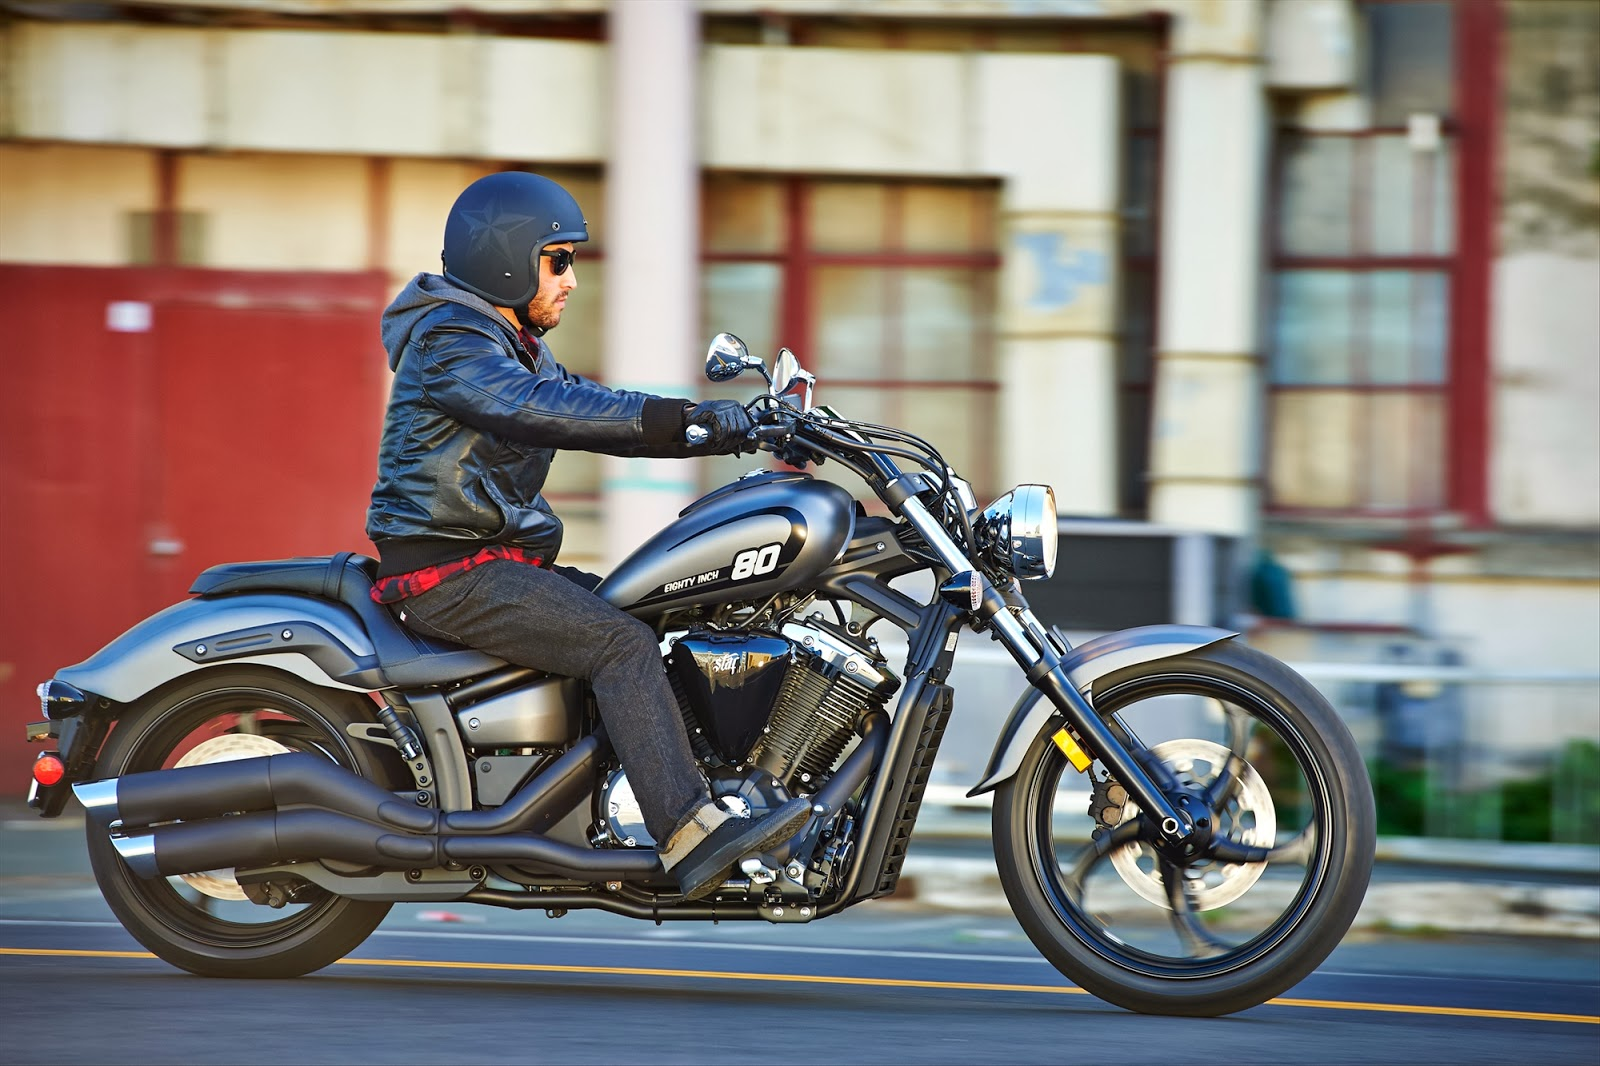 Motocicleta Yamaha Stryker 2014